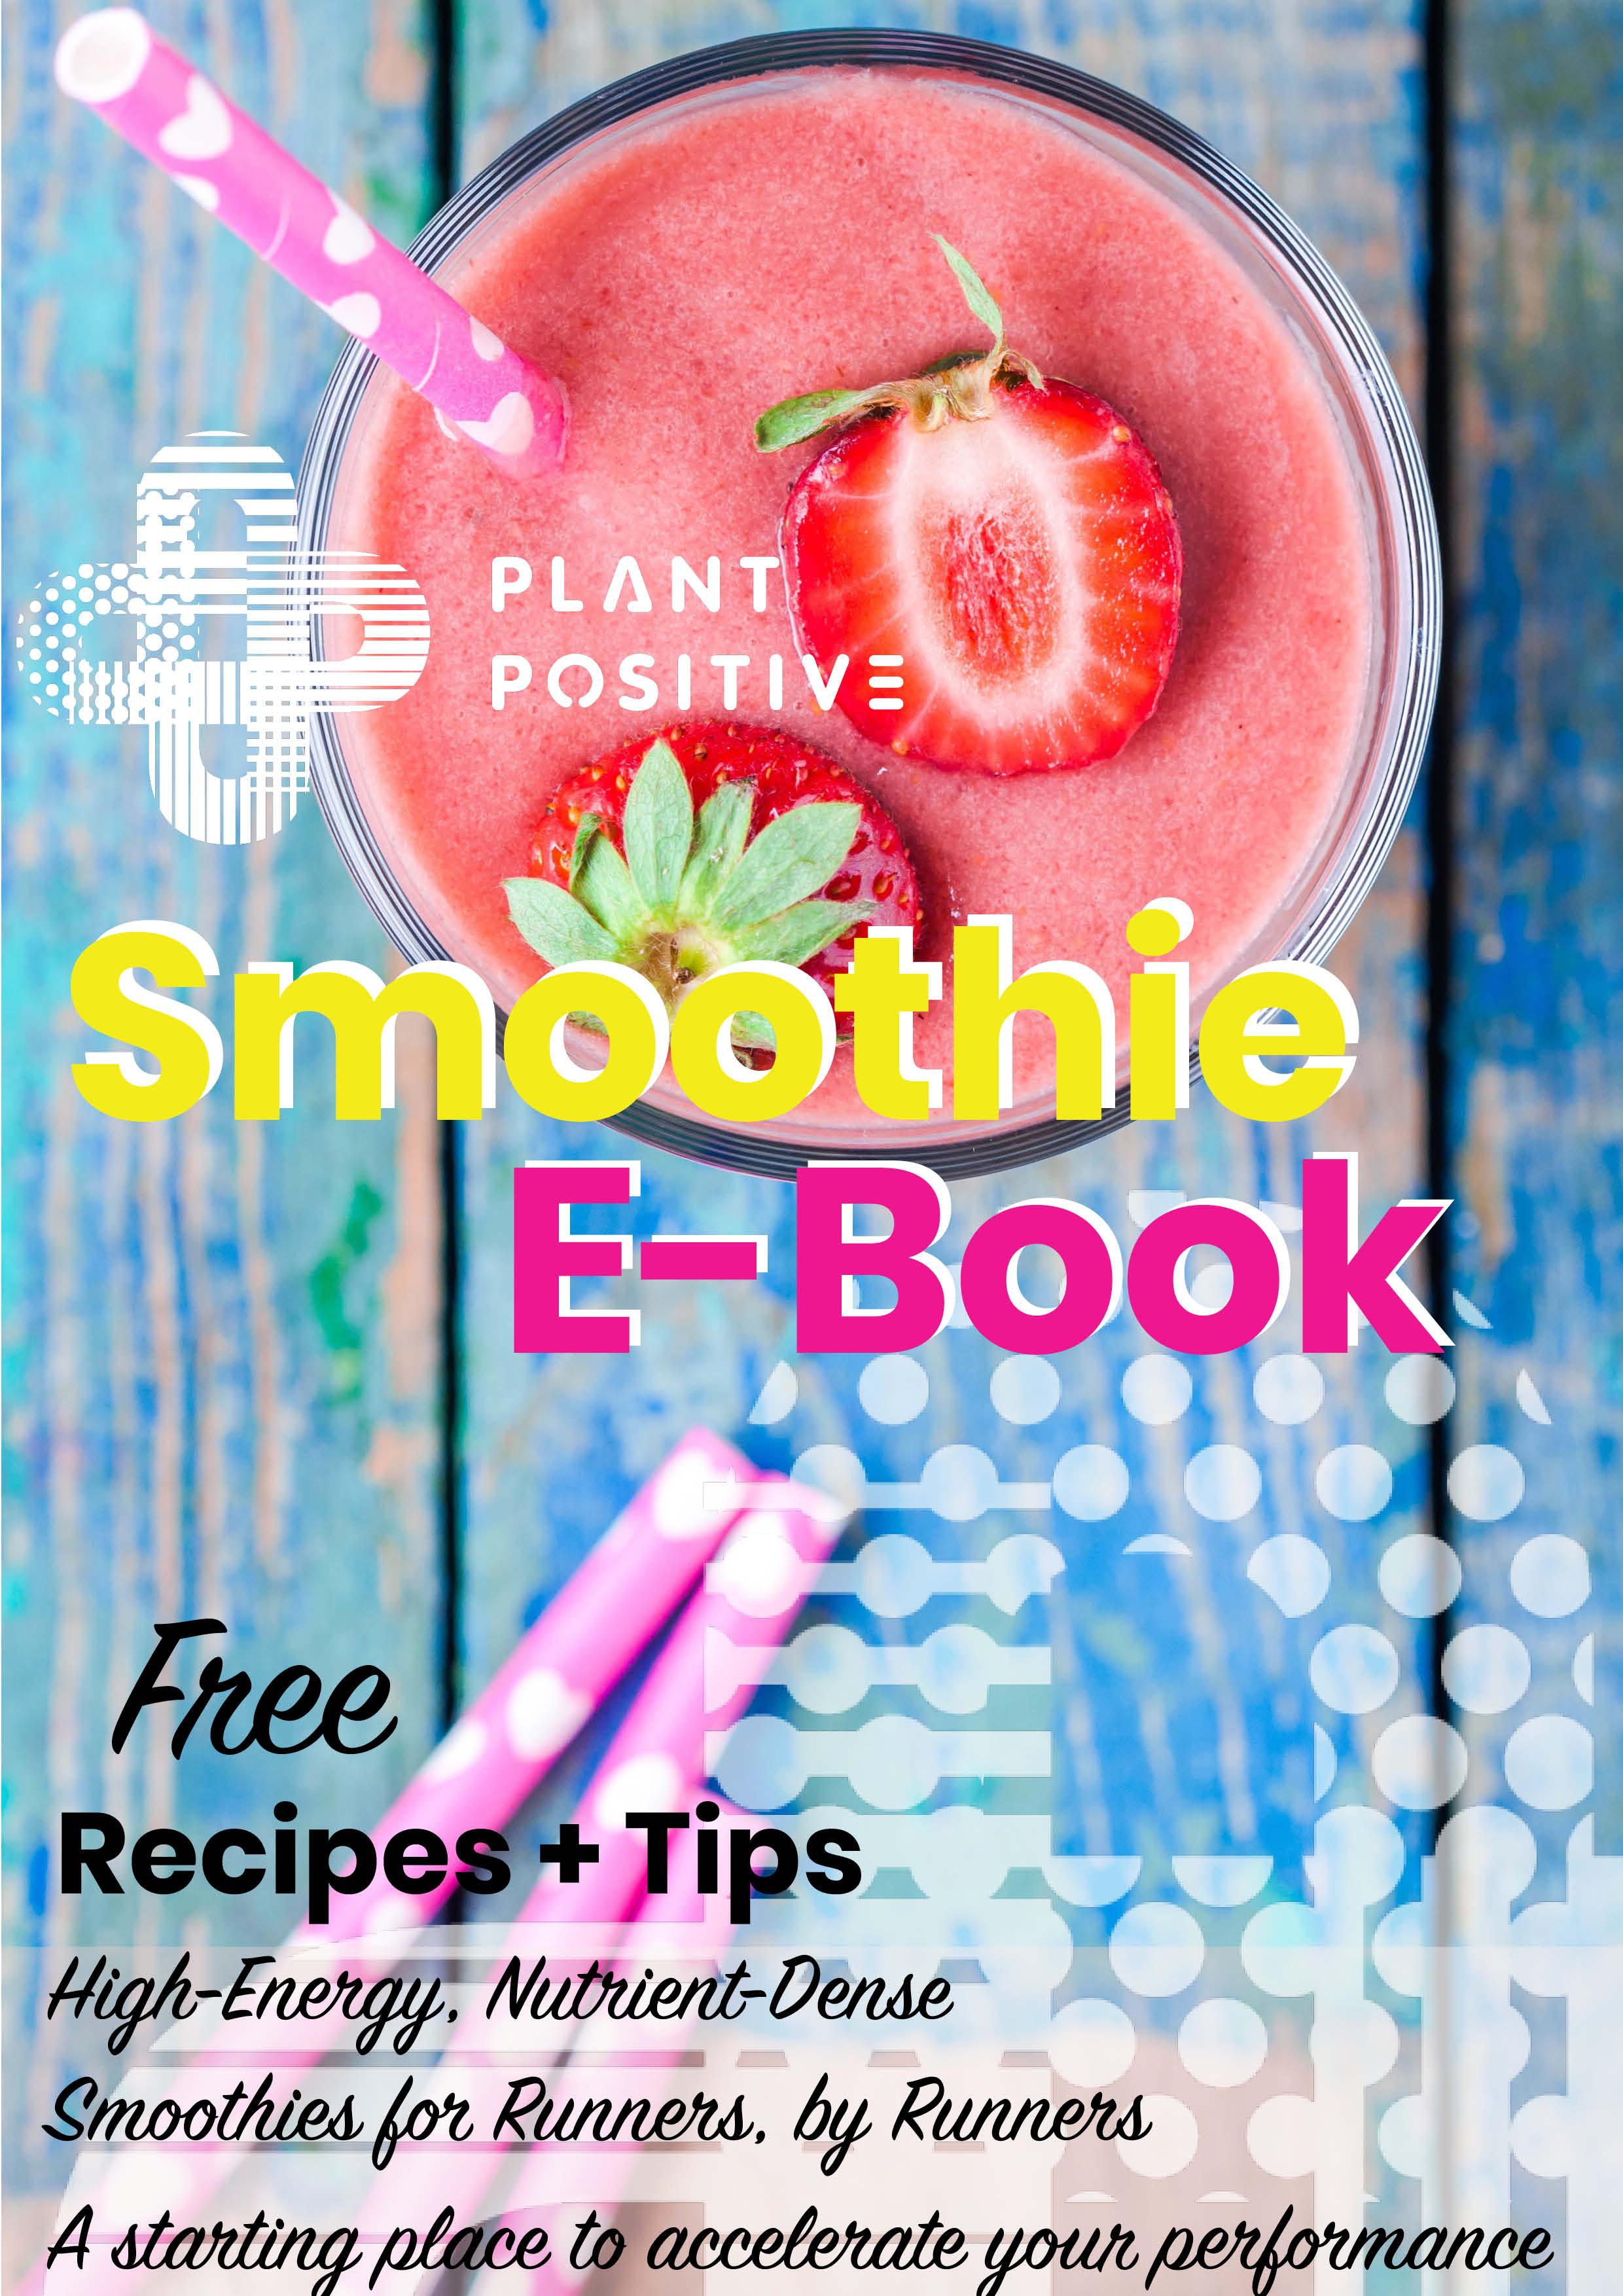 Cover-Smoothie-Ebook-PlantPositiveRunning-11-10-17.jpg